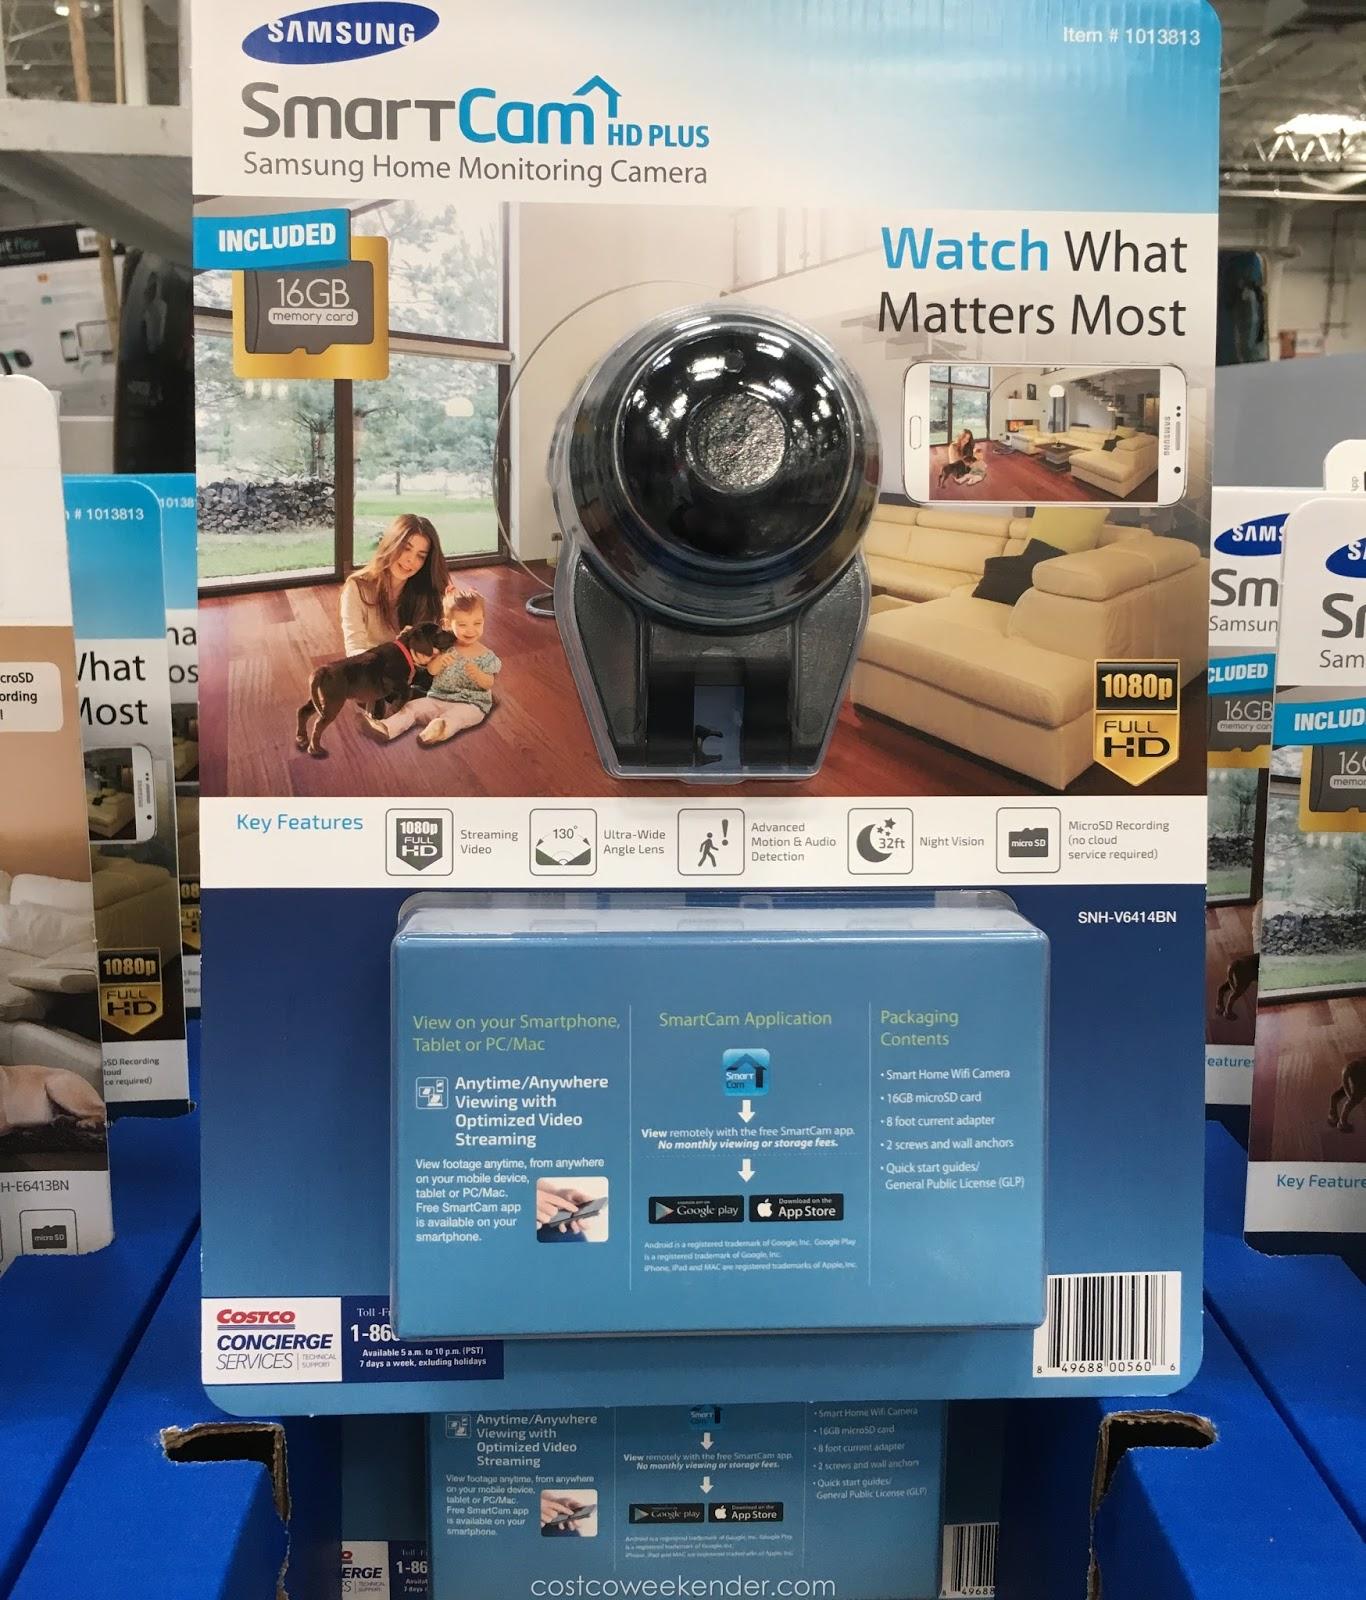 Samsung SmartCam HD Plus Home Monitoring Camera SNH-V6414BN ...